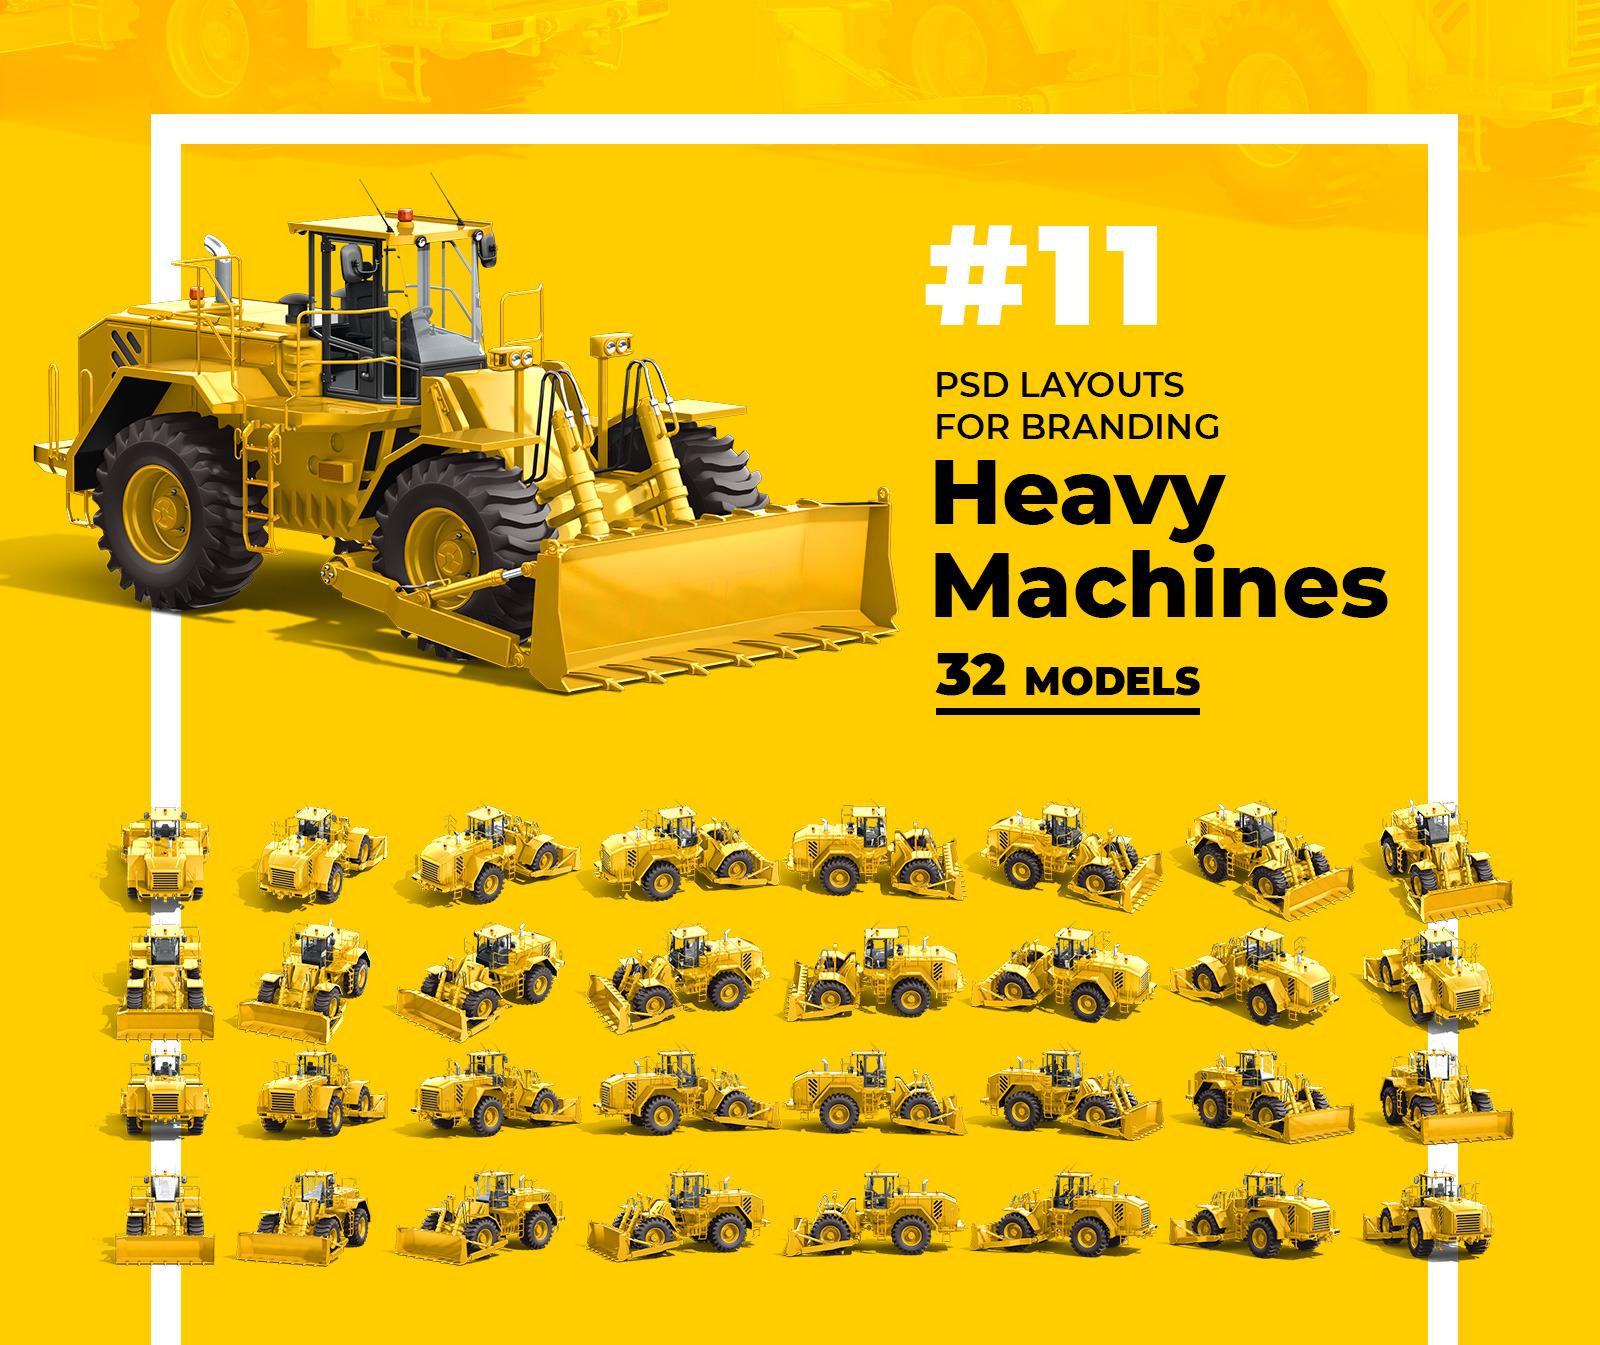 PSD Mockup 3D model Heavy Machines - Wheel Dozer #11